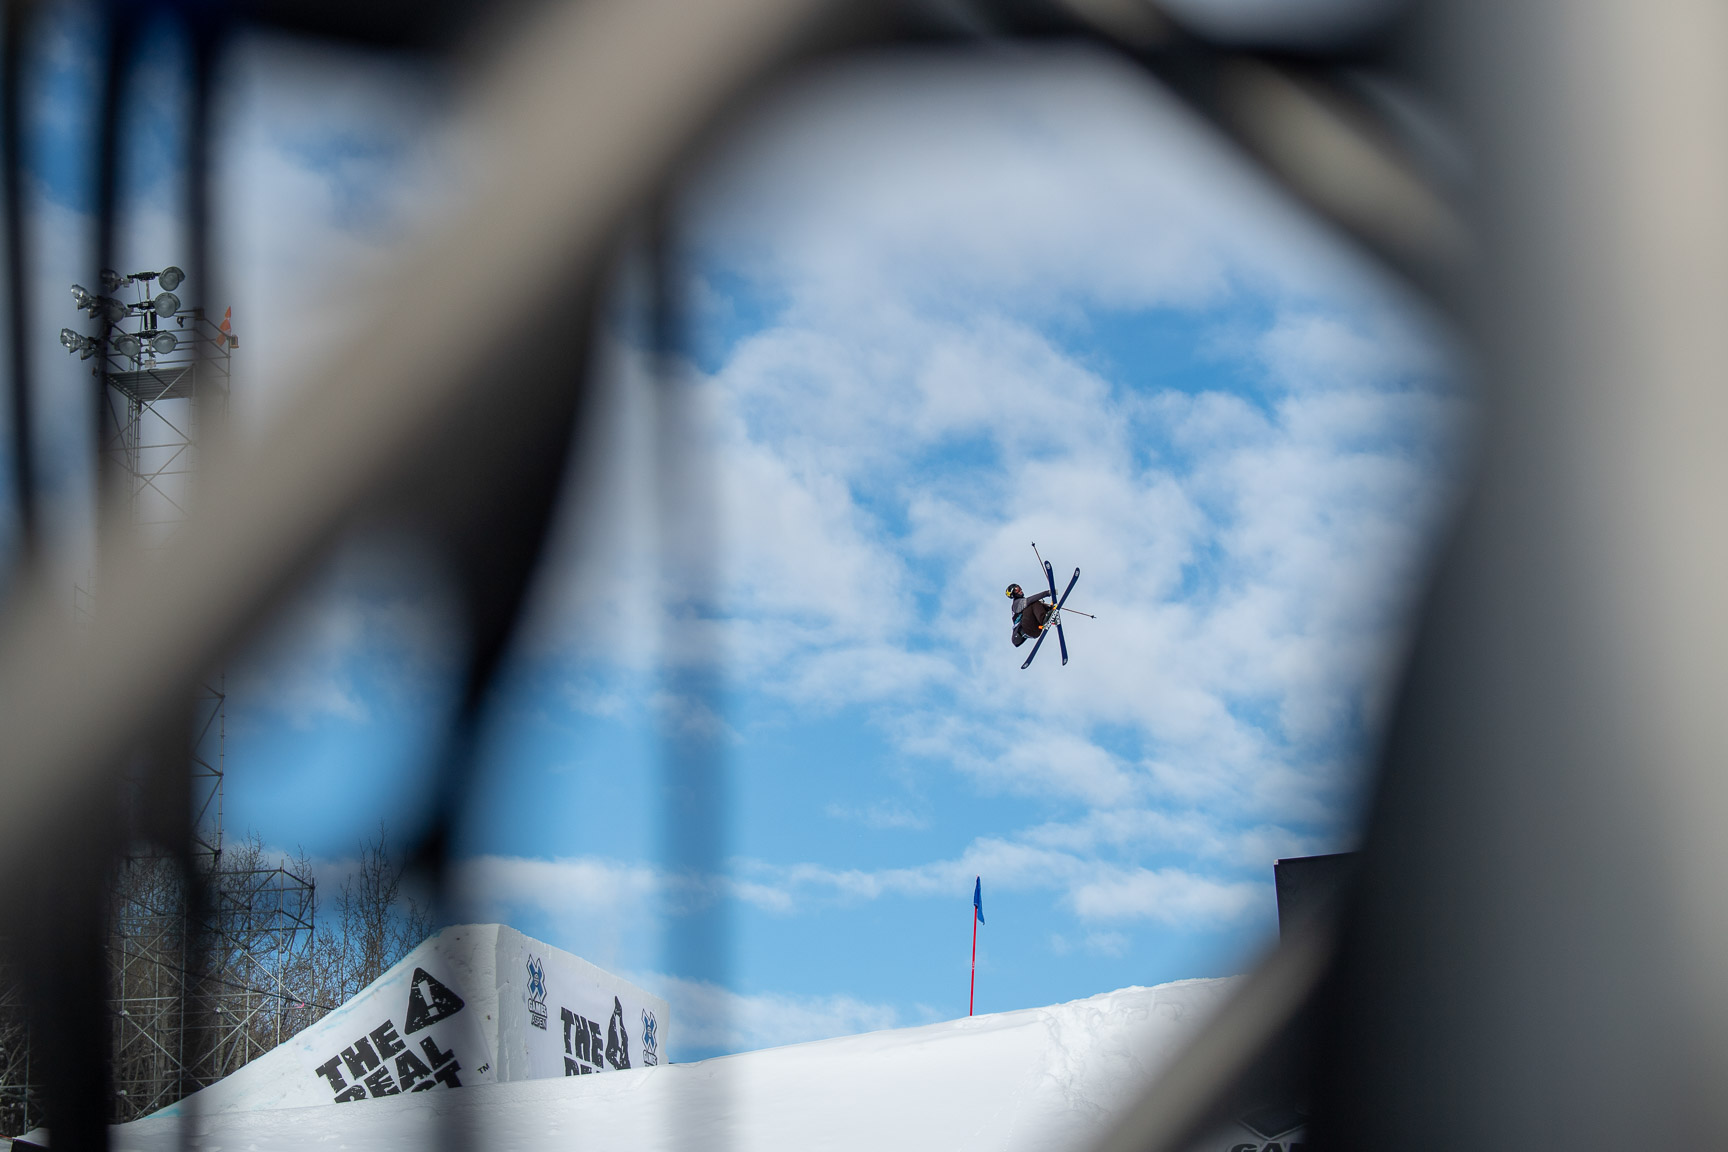 Alex Hall, Men's Ski Big Air Elim